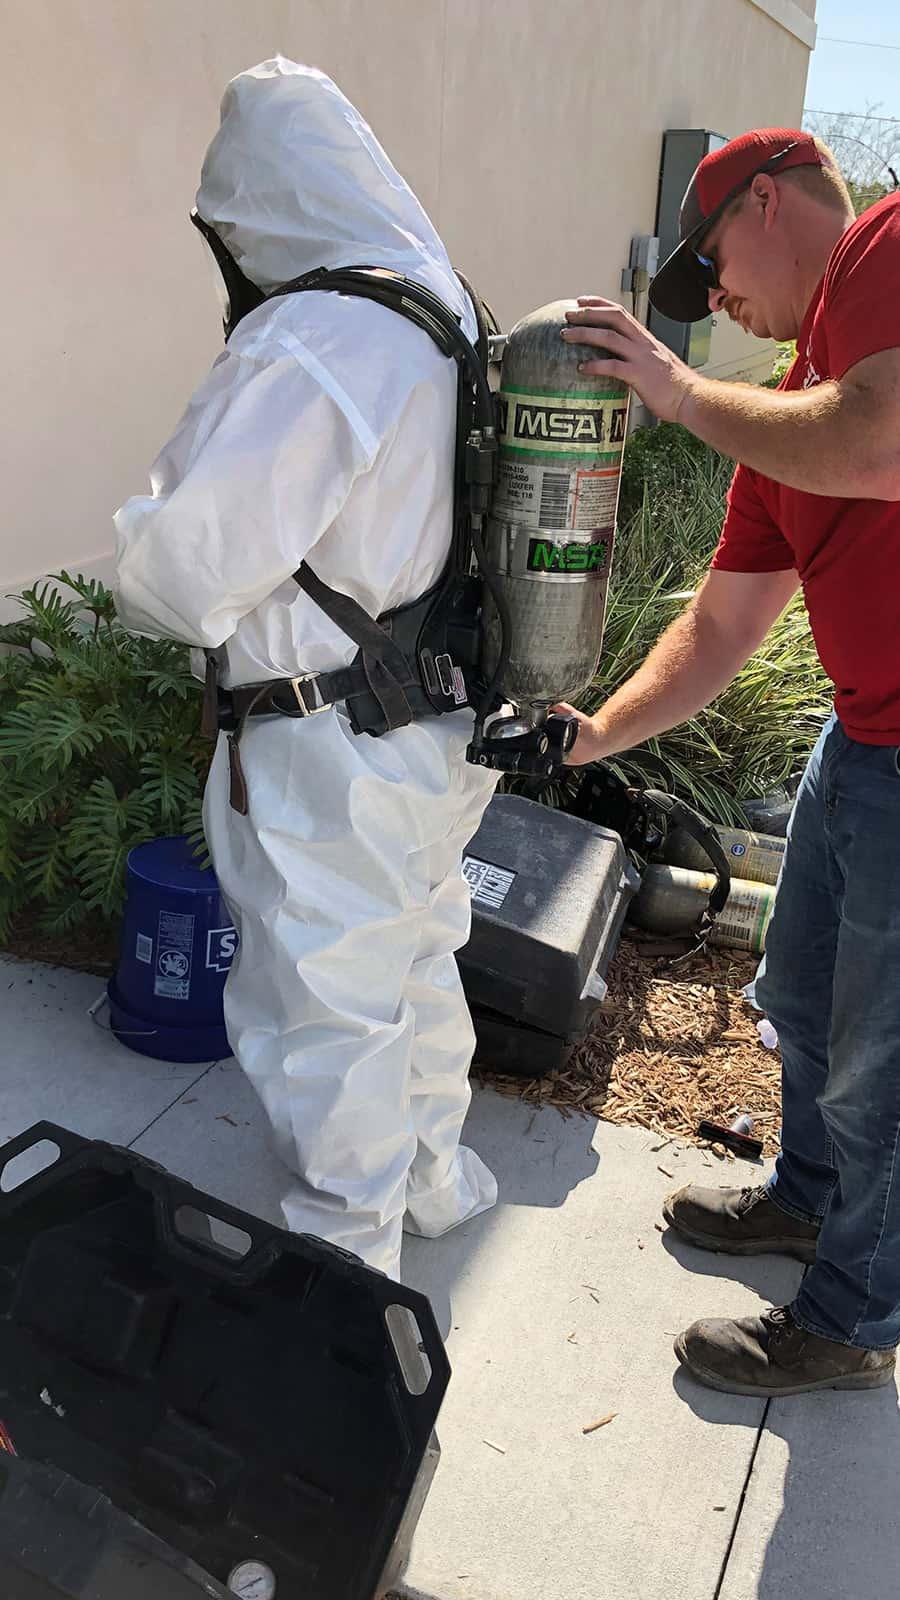 Putting on sanitization gear.